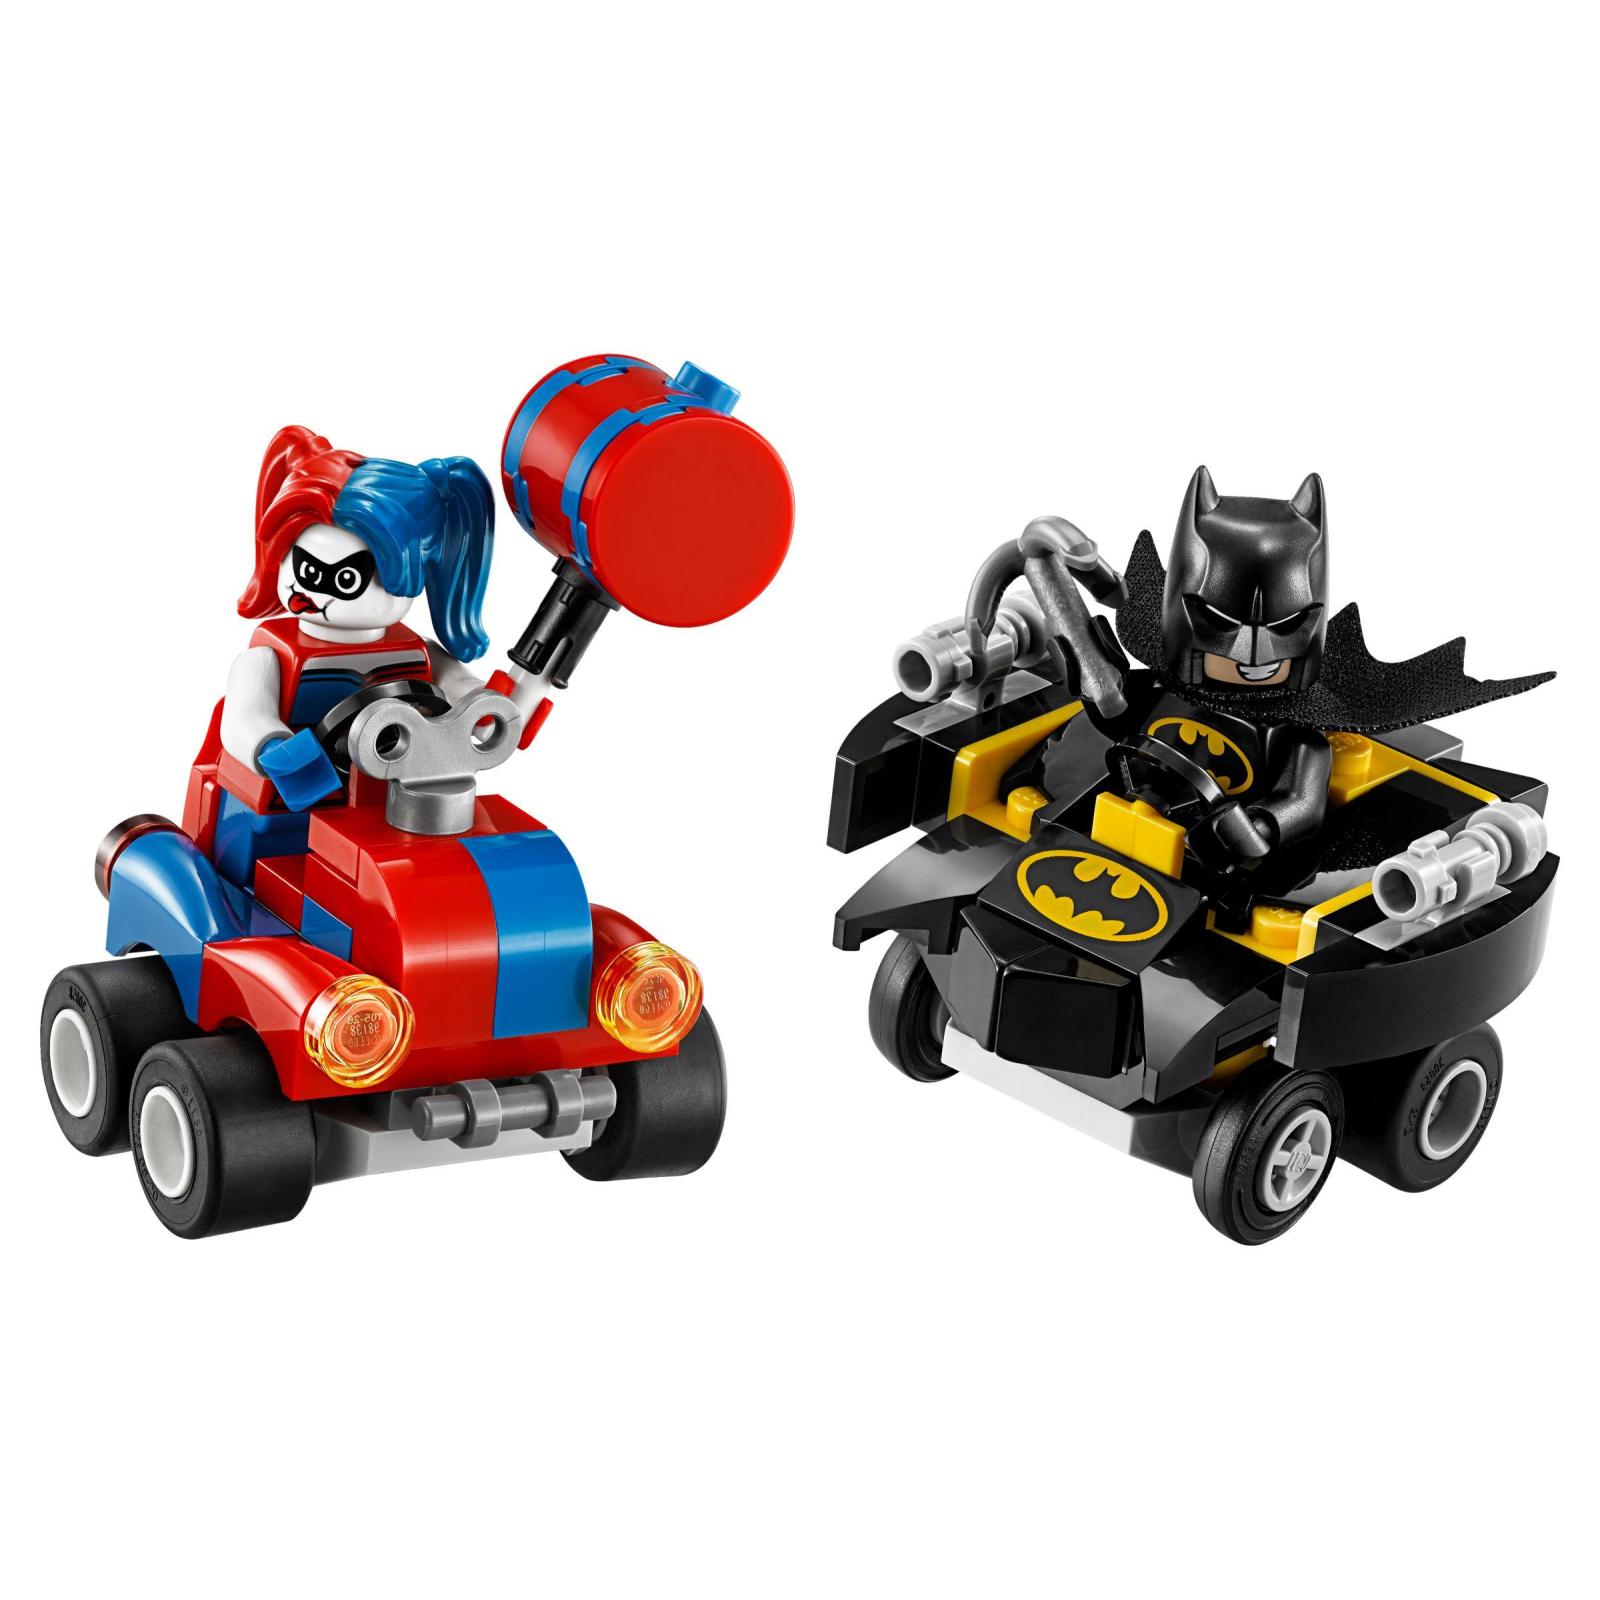 Конструктор LEGO Super Heroes Mighty Micros: Бэтмен против Харли Квин (76092) изображение 2